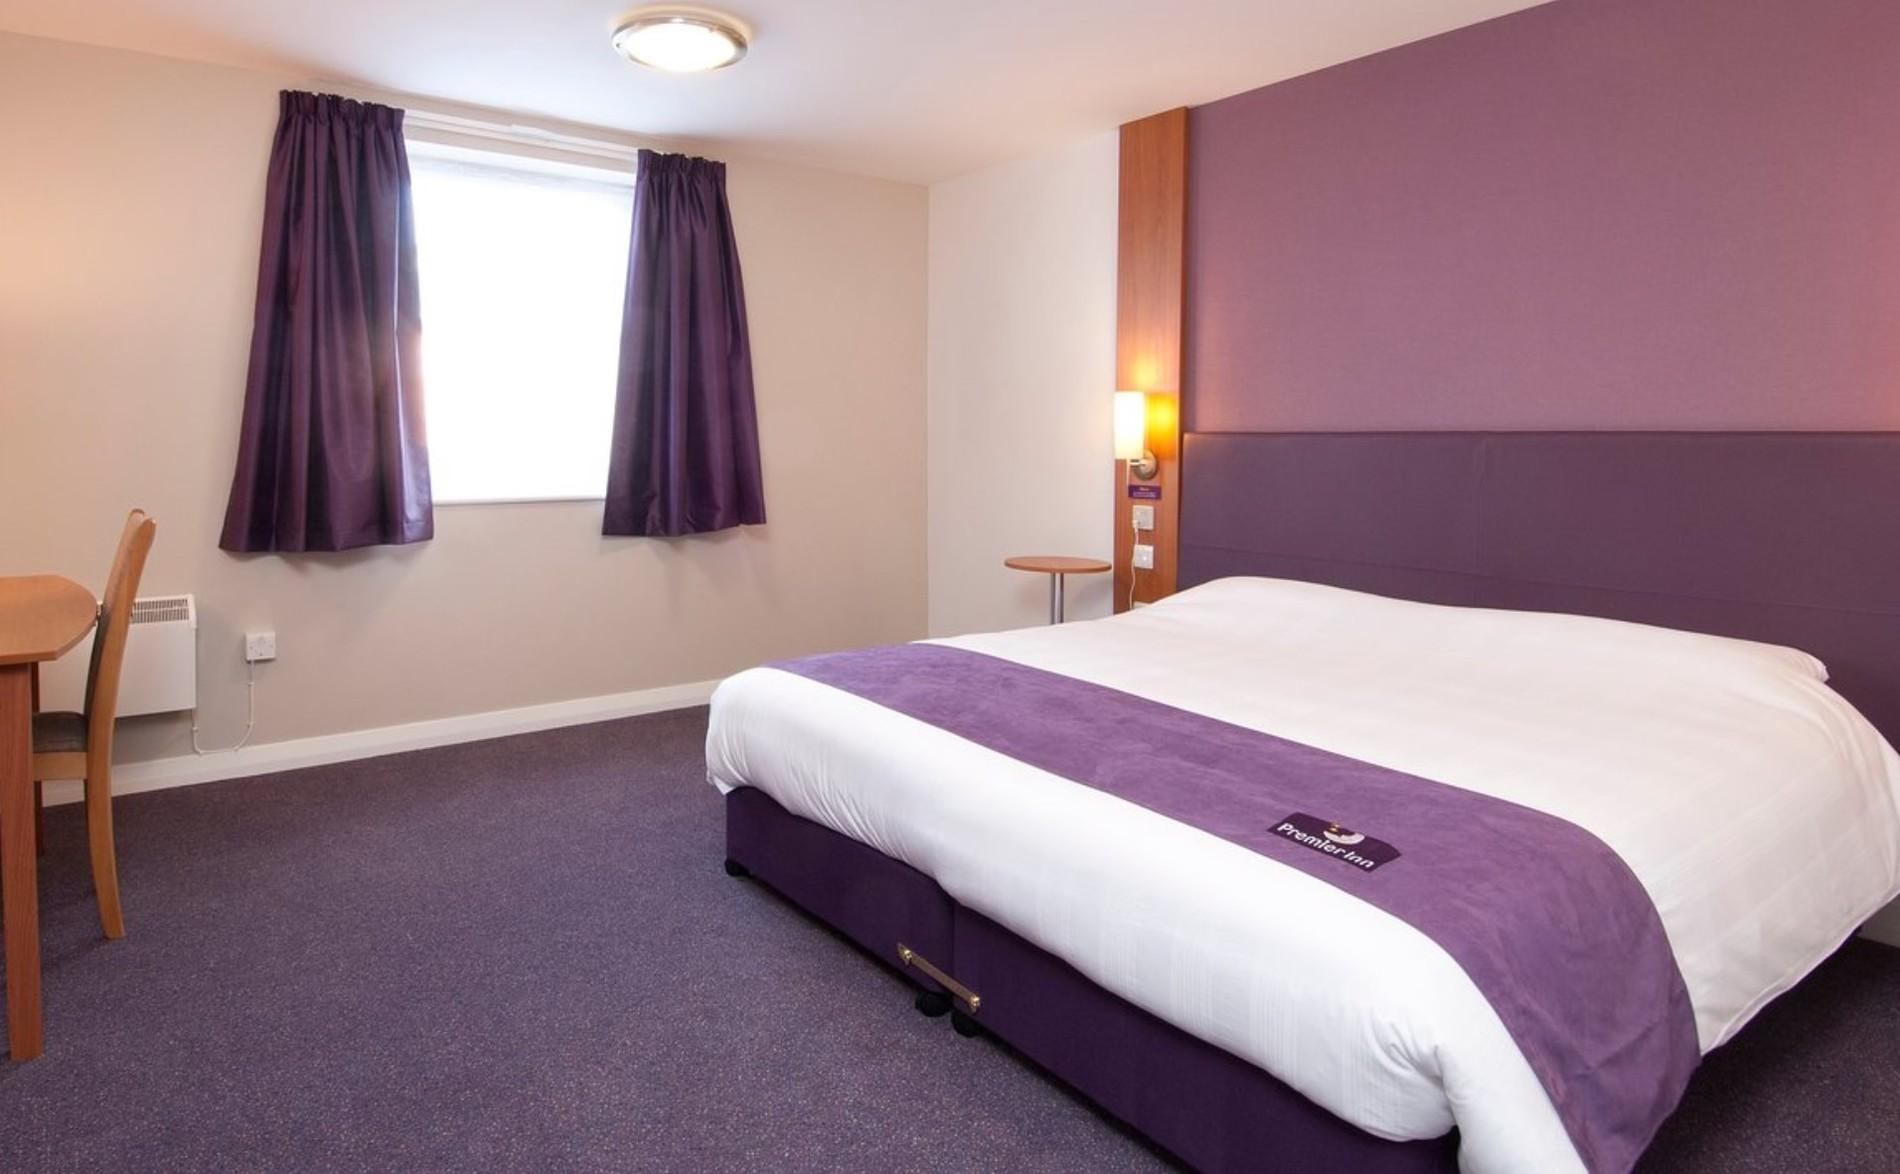 Premier Inn accessible bedroom